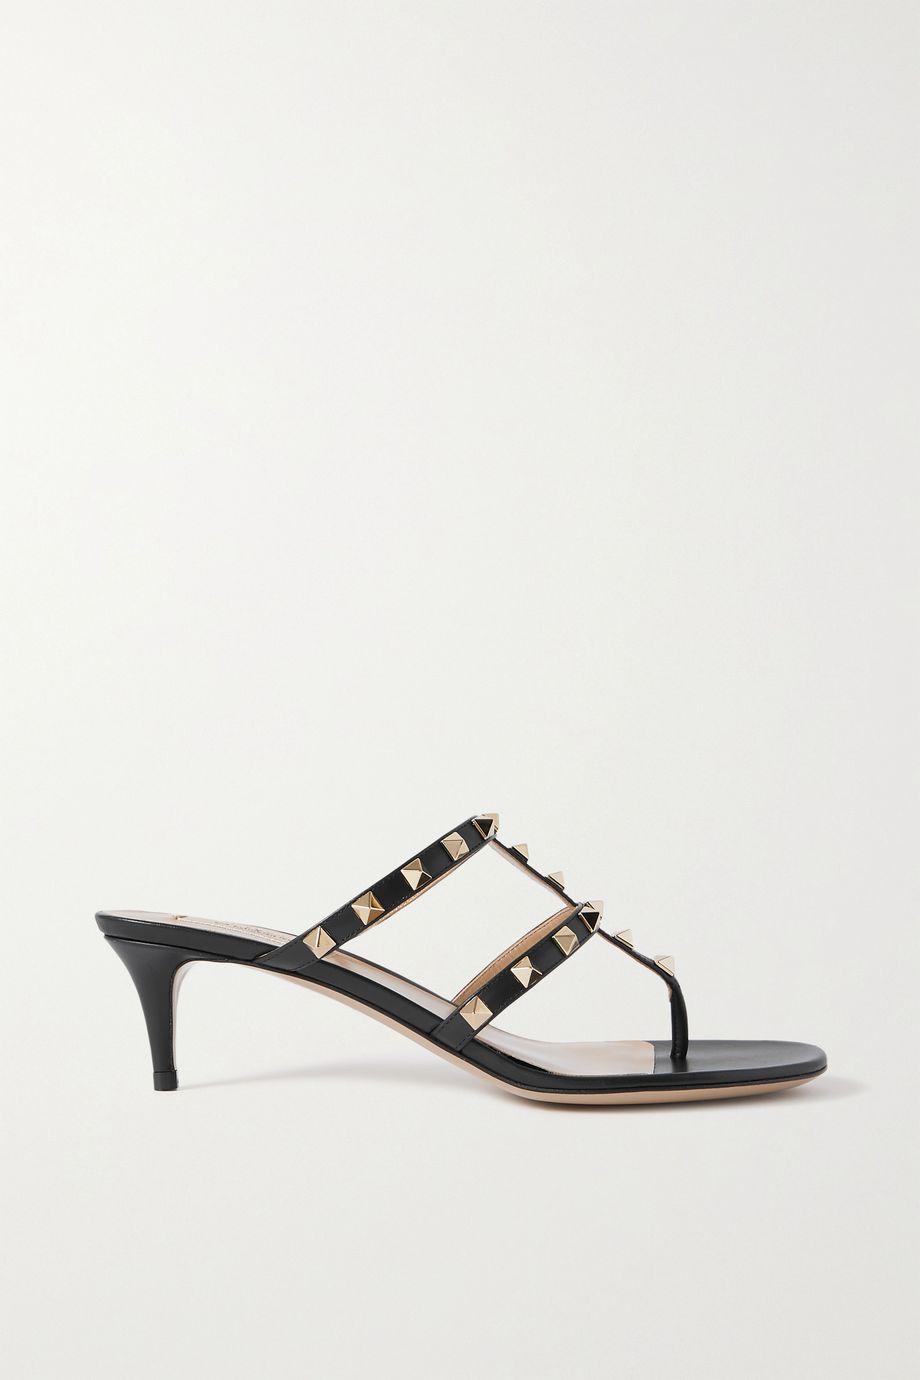 Valentino Valentino Garavani Rockstud 50 leather sandals